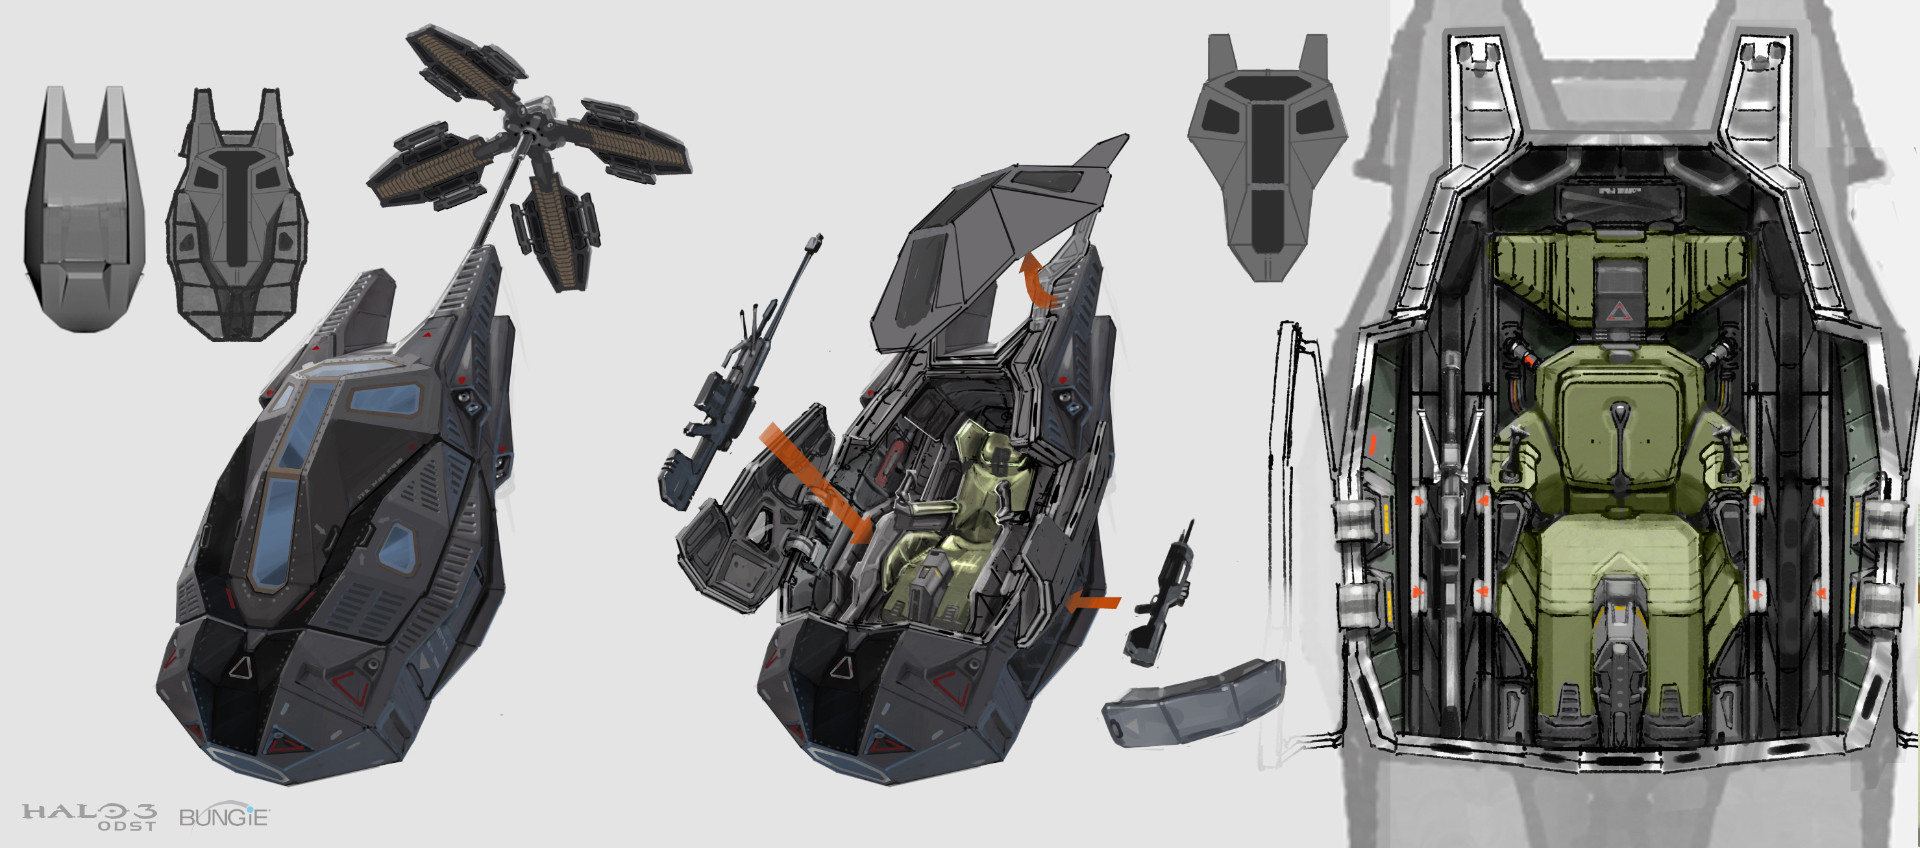 Datei:Halo3-ODST PodConcept-03.jpg